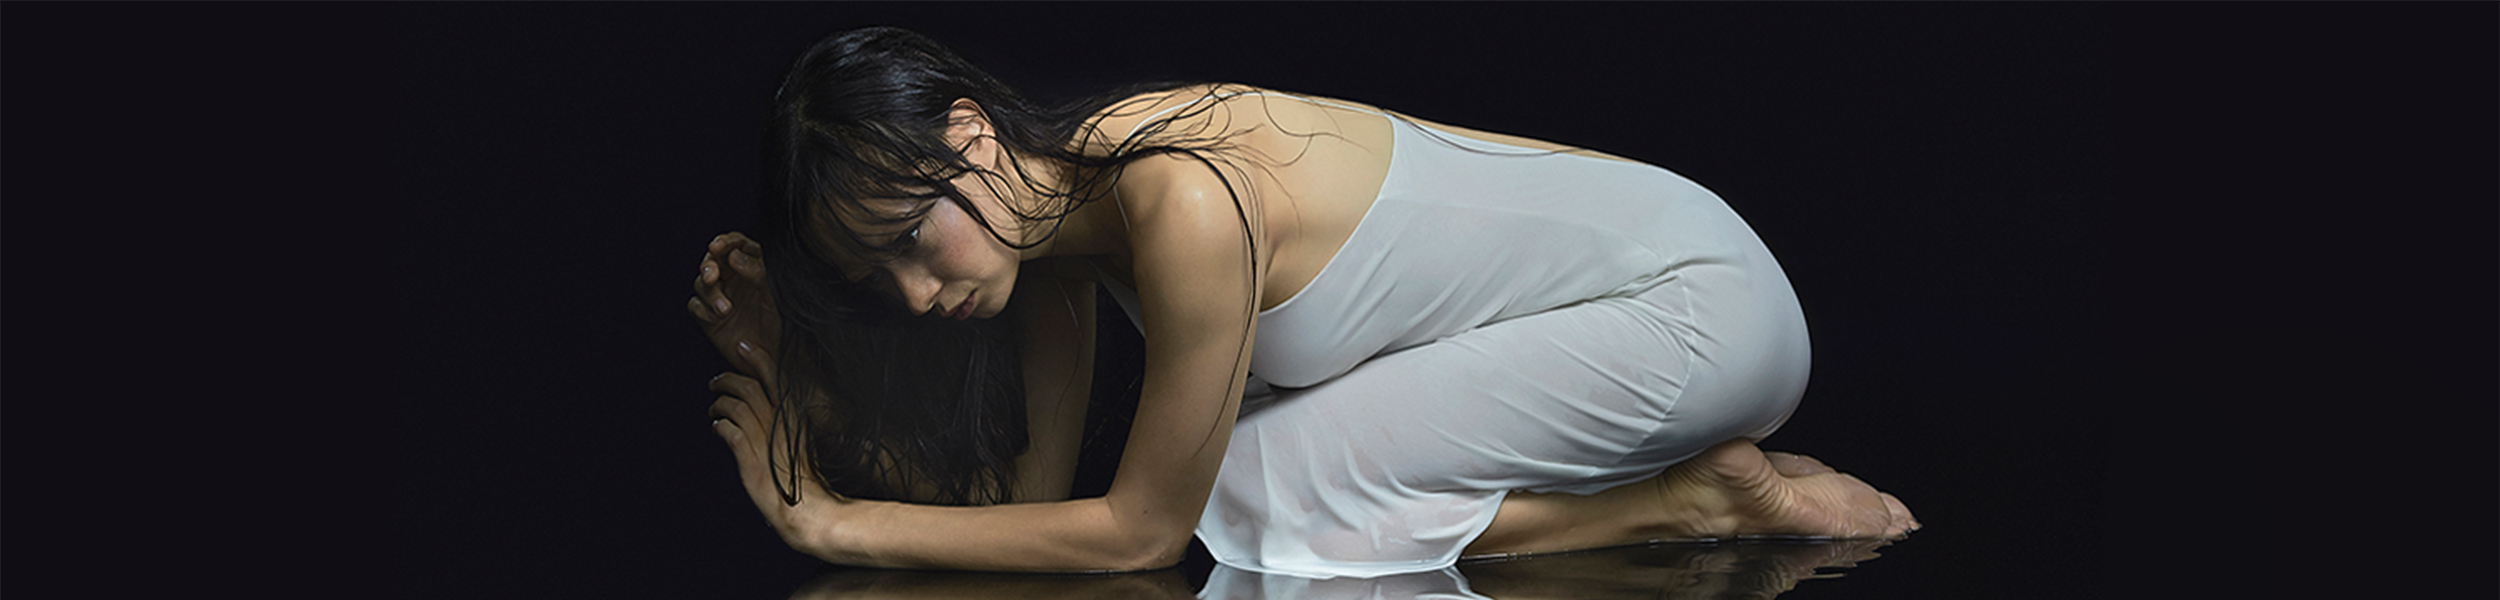 Lucinda Chua - title